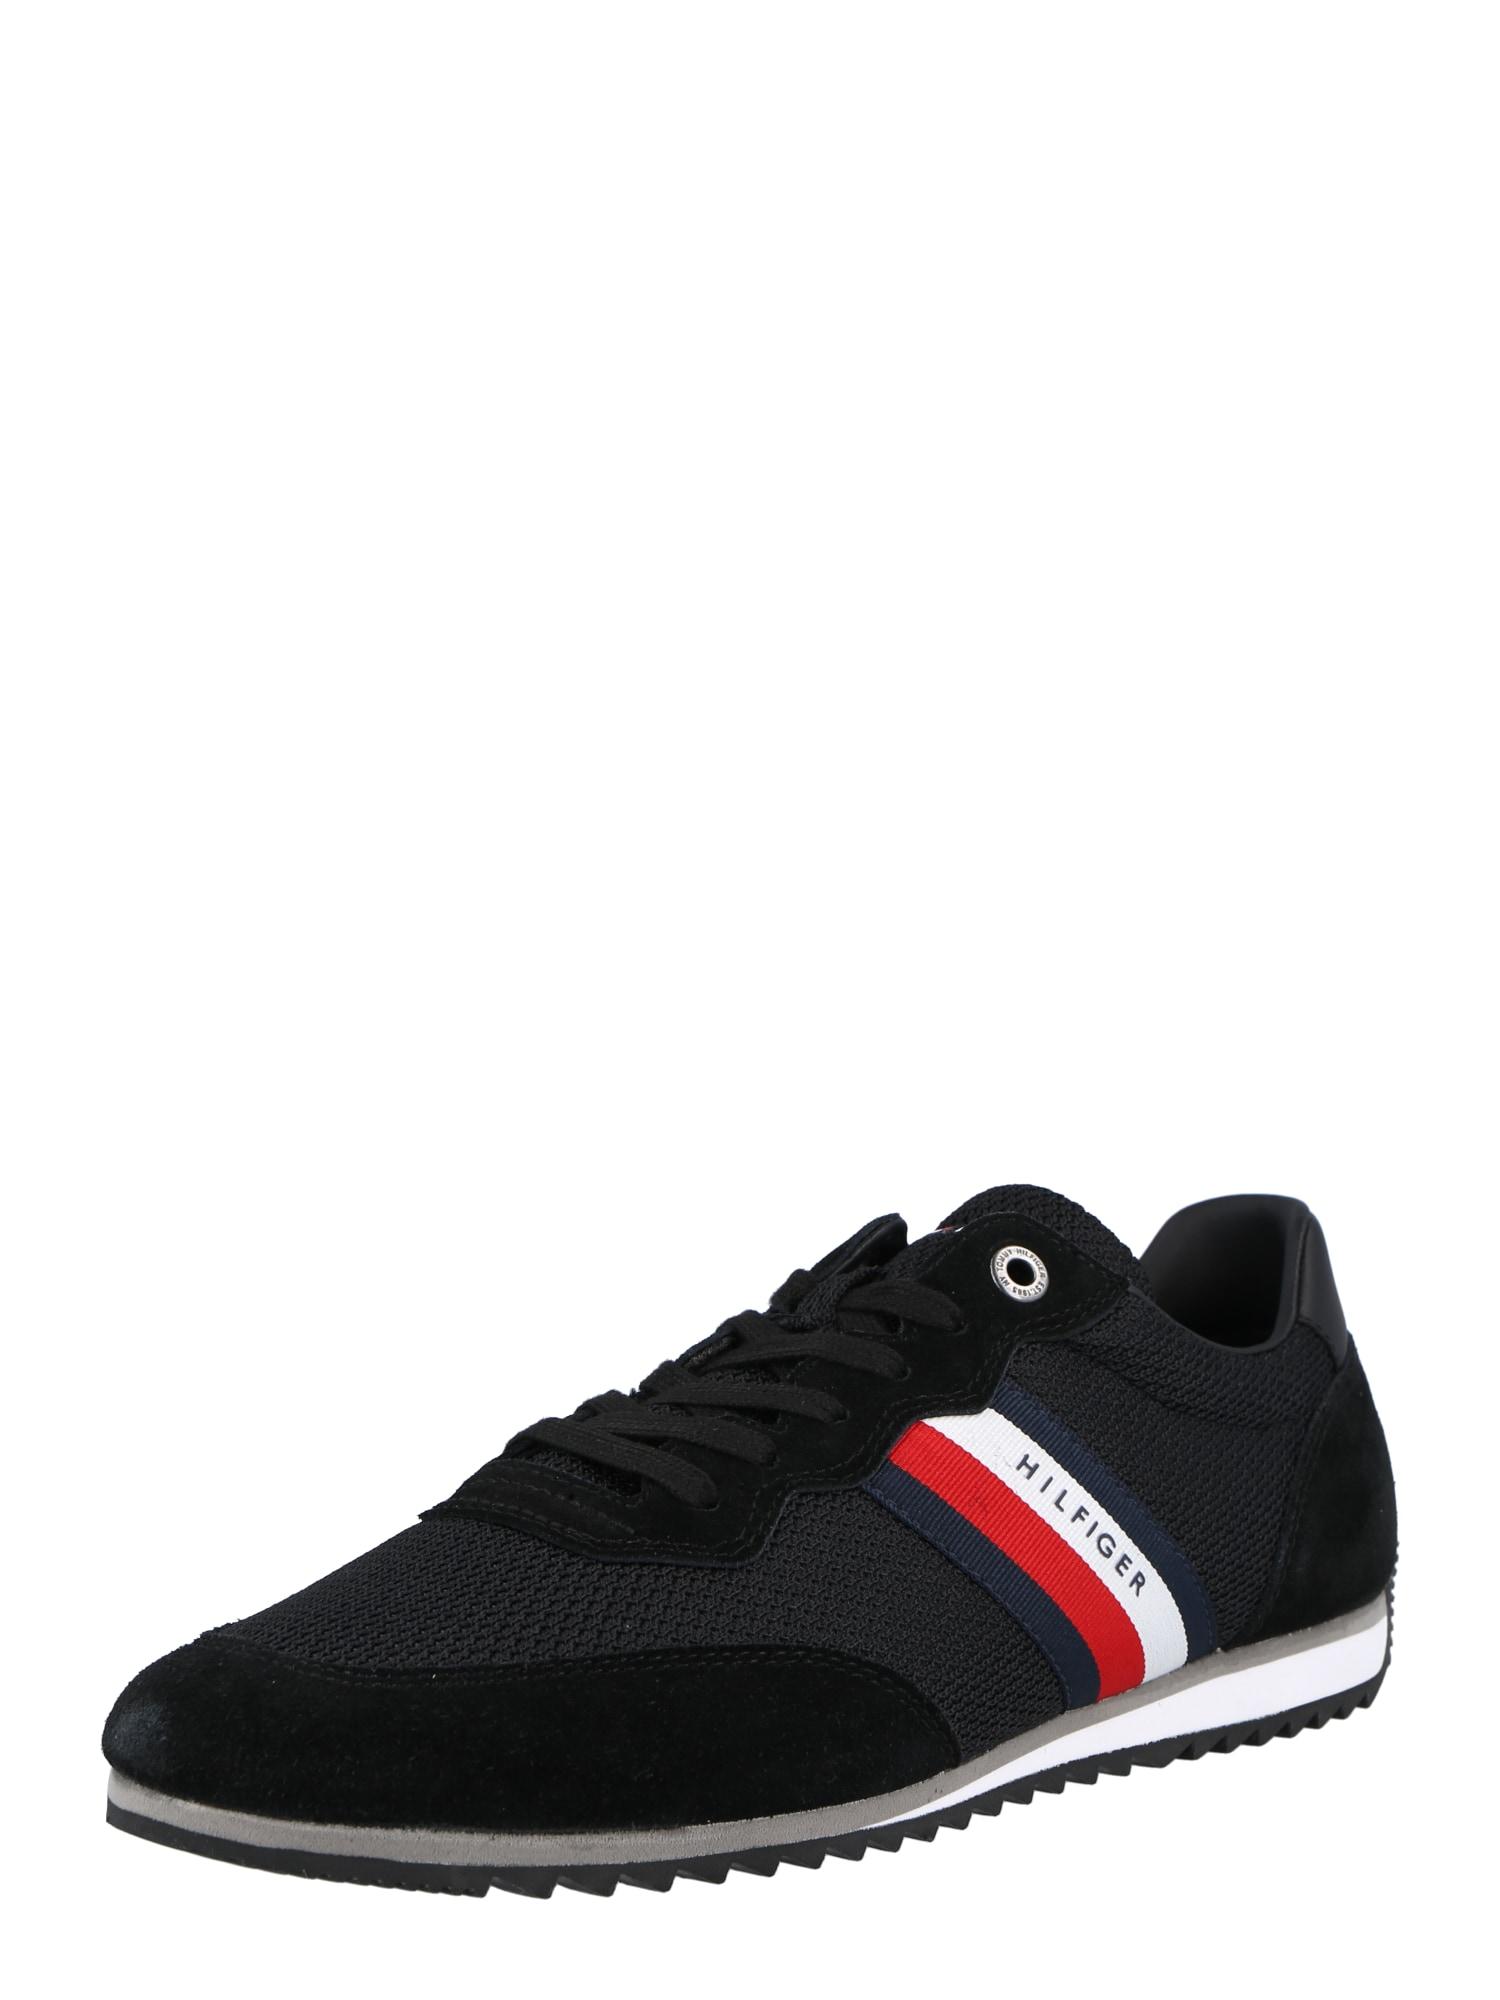 TOMMY HILFIGER Nízke tenisky  čierna / biela / ohnivo červená / námornícka modrá